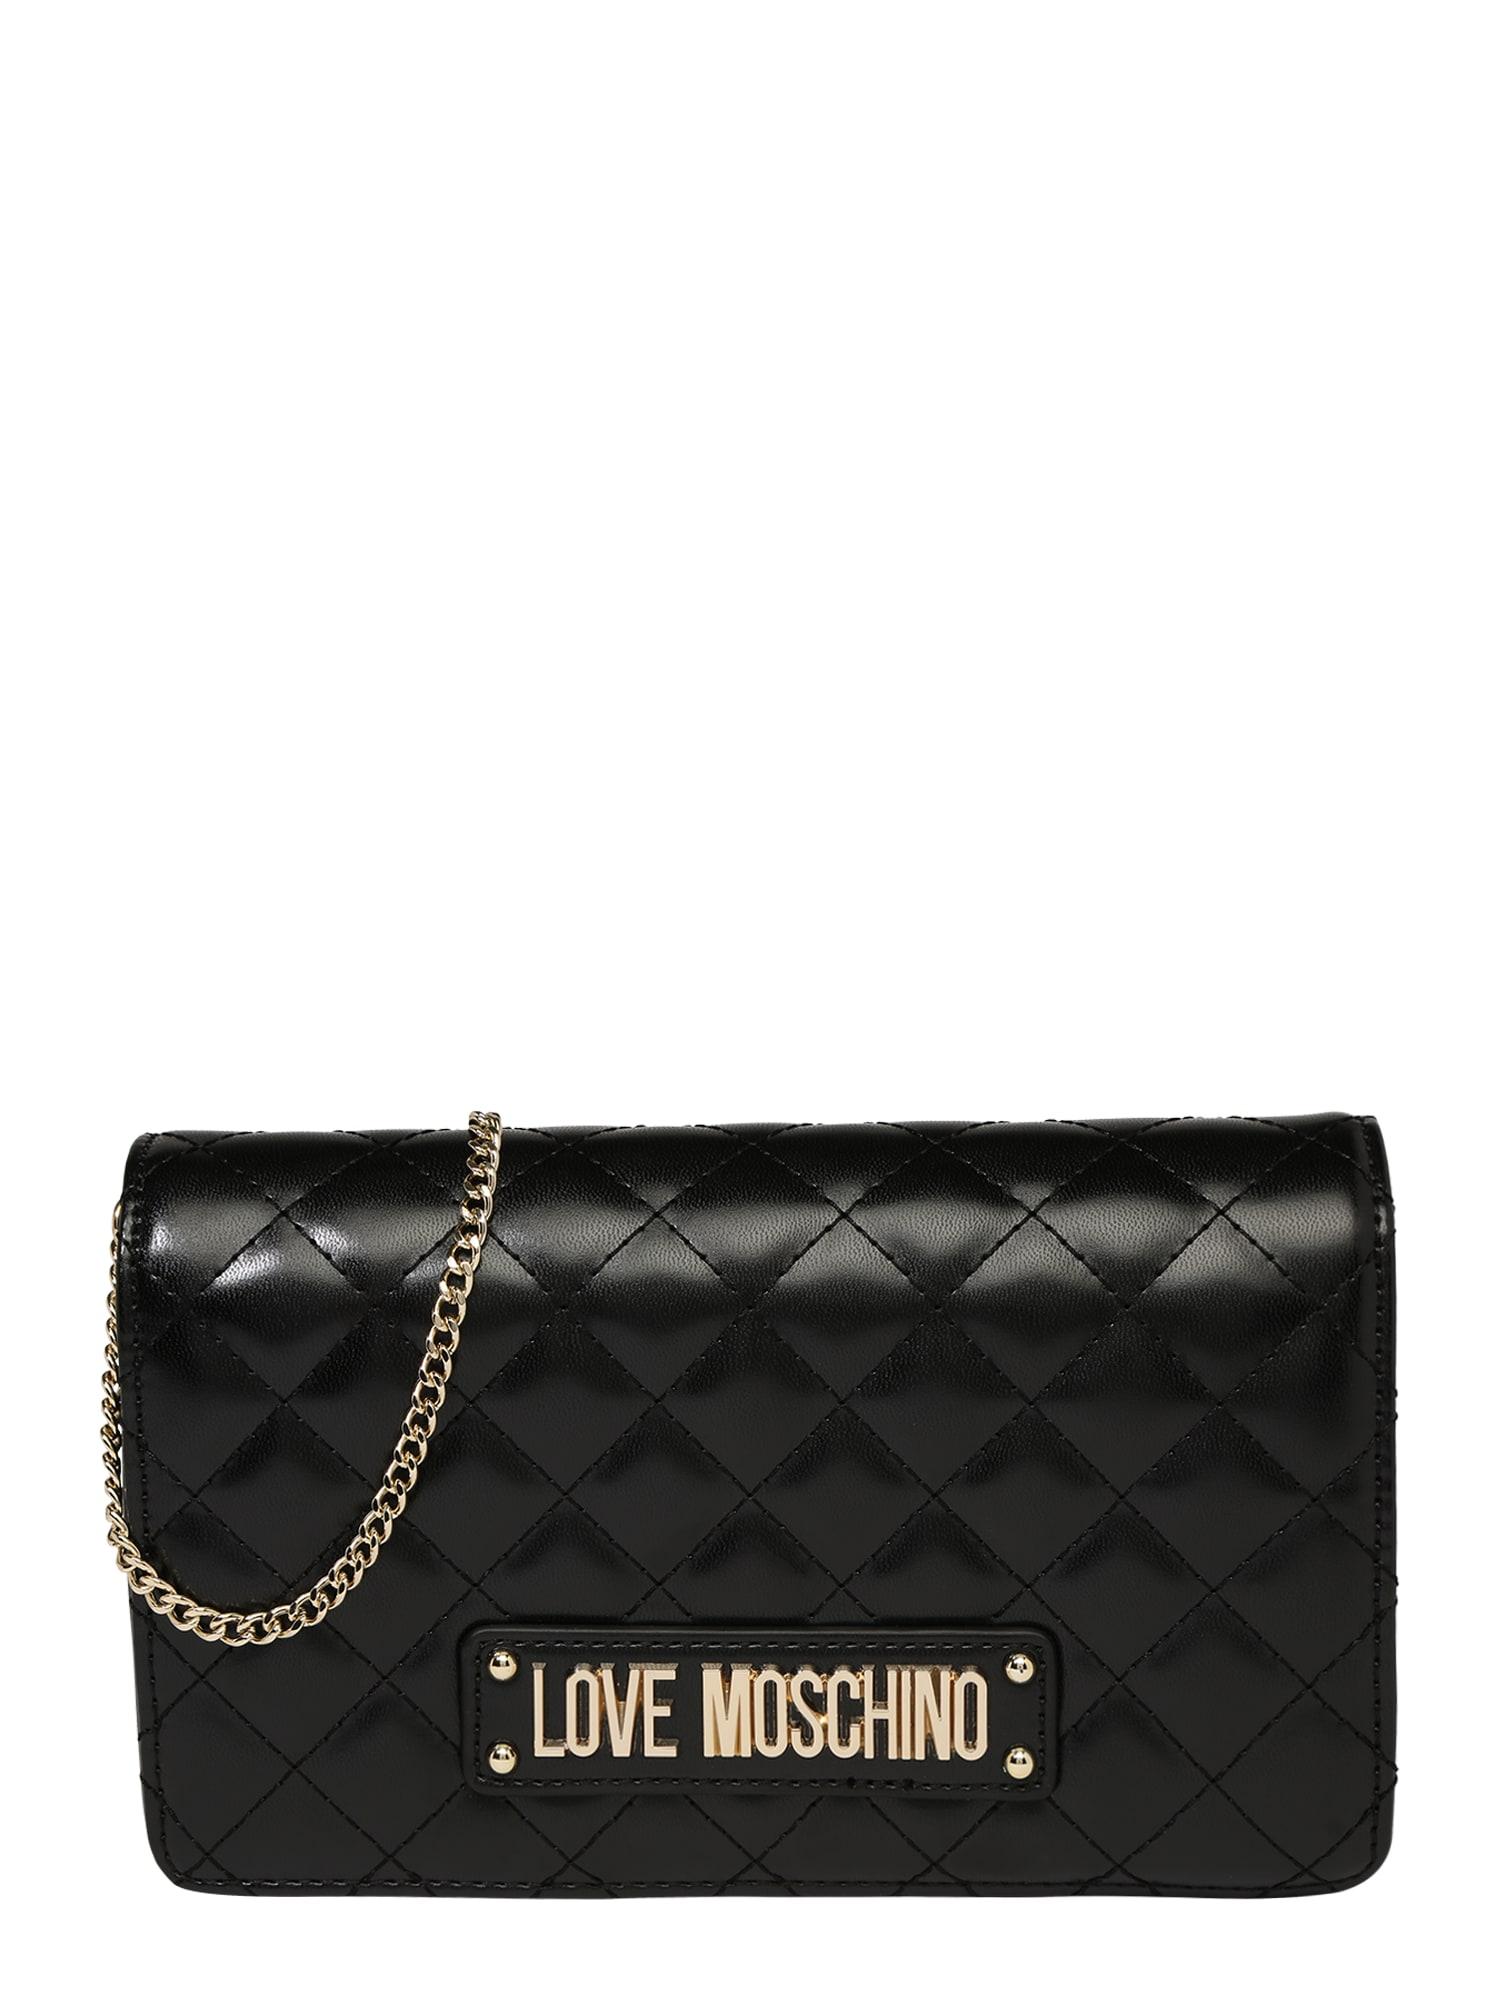 Taška přes rameno BORSA QUILTED NAPPA PU NERO černá Love Moschino